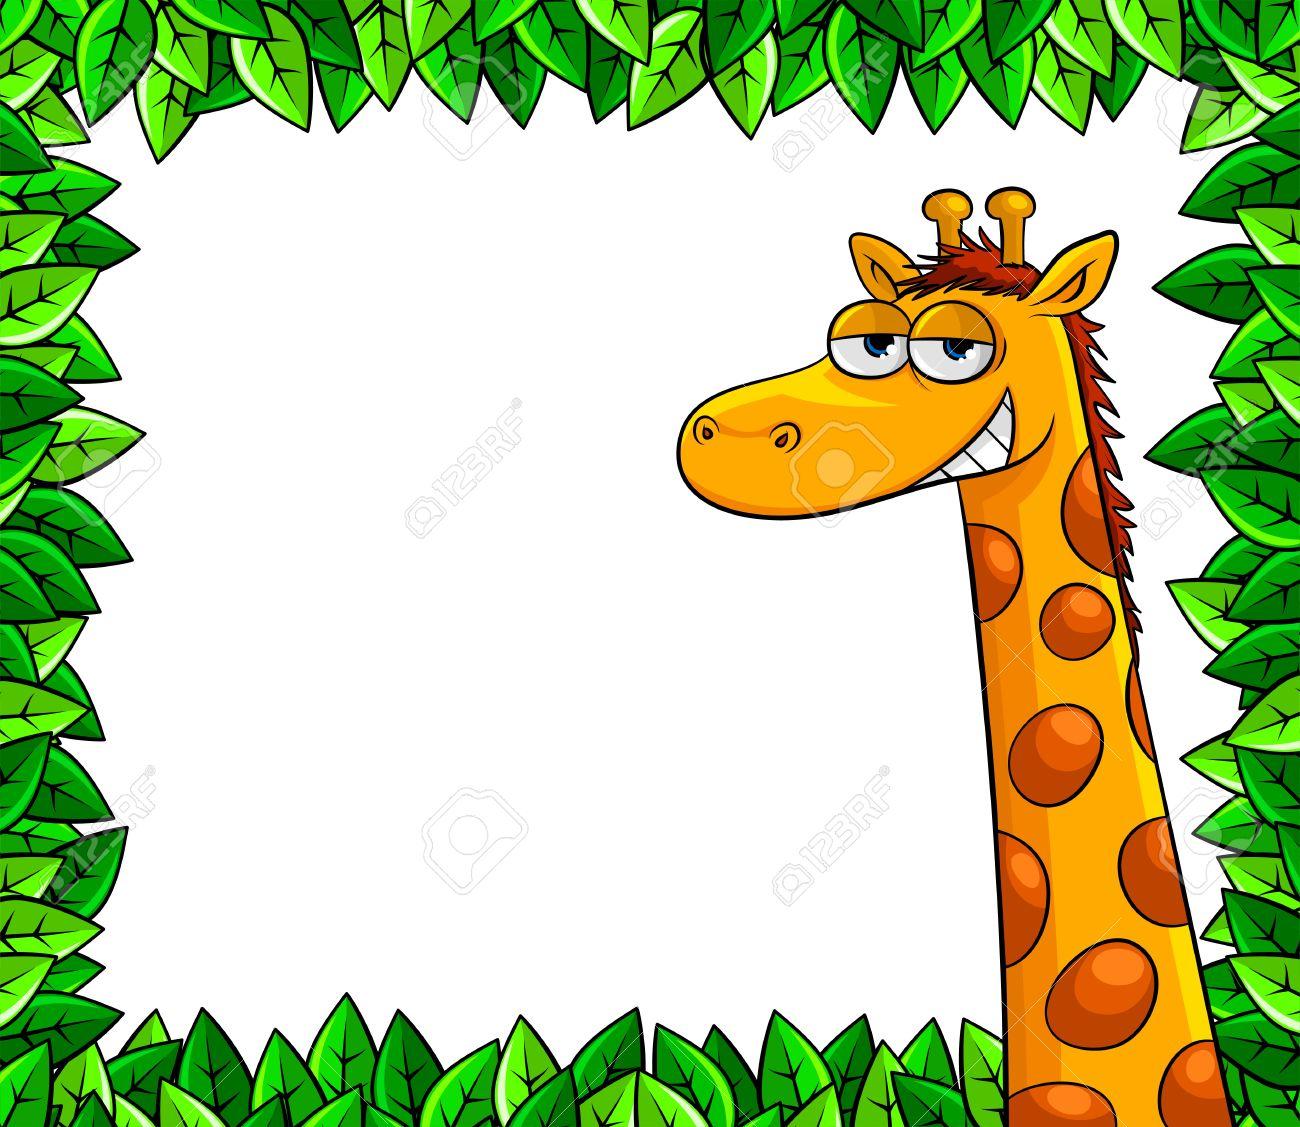 funny giraffe in a frame of leaves Stock Vector - 16511453